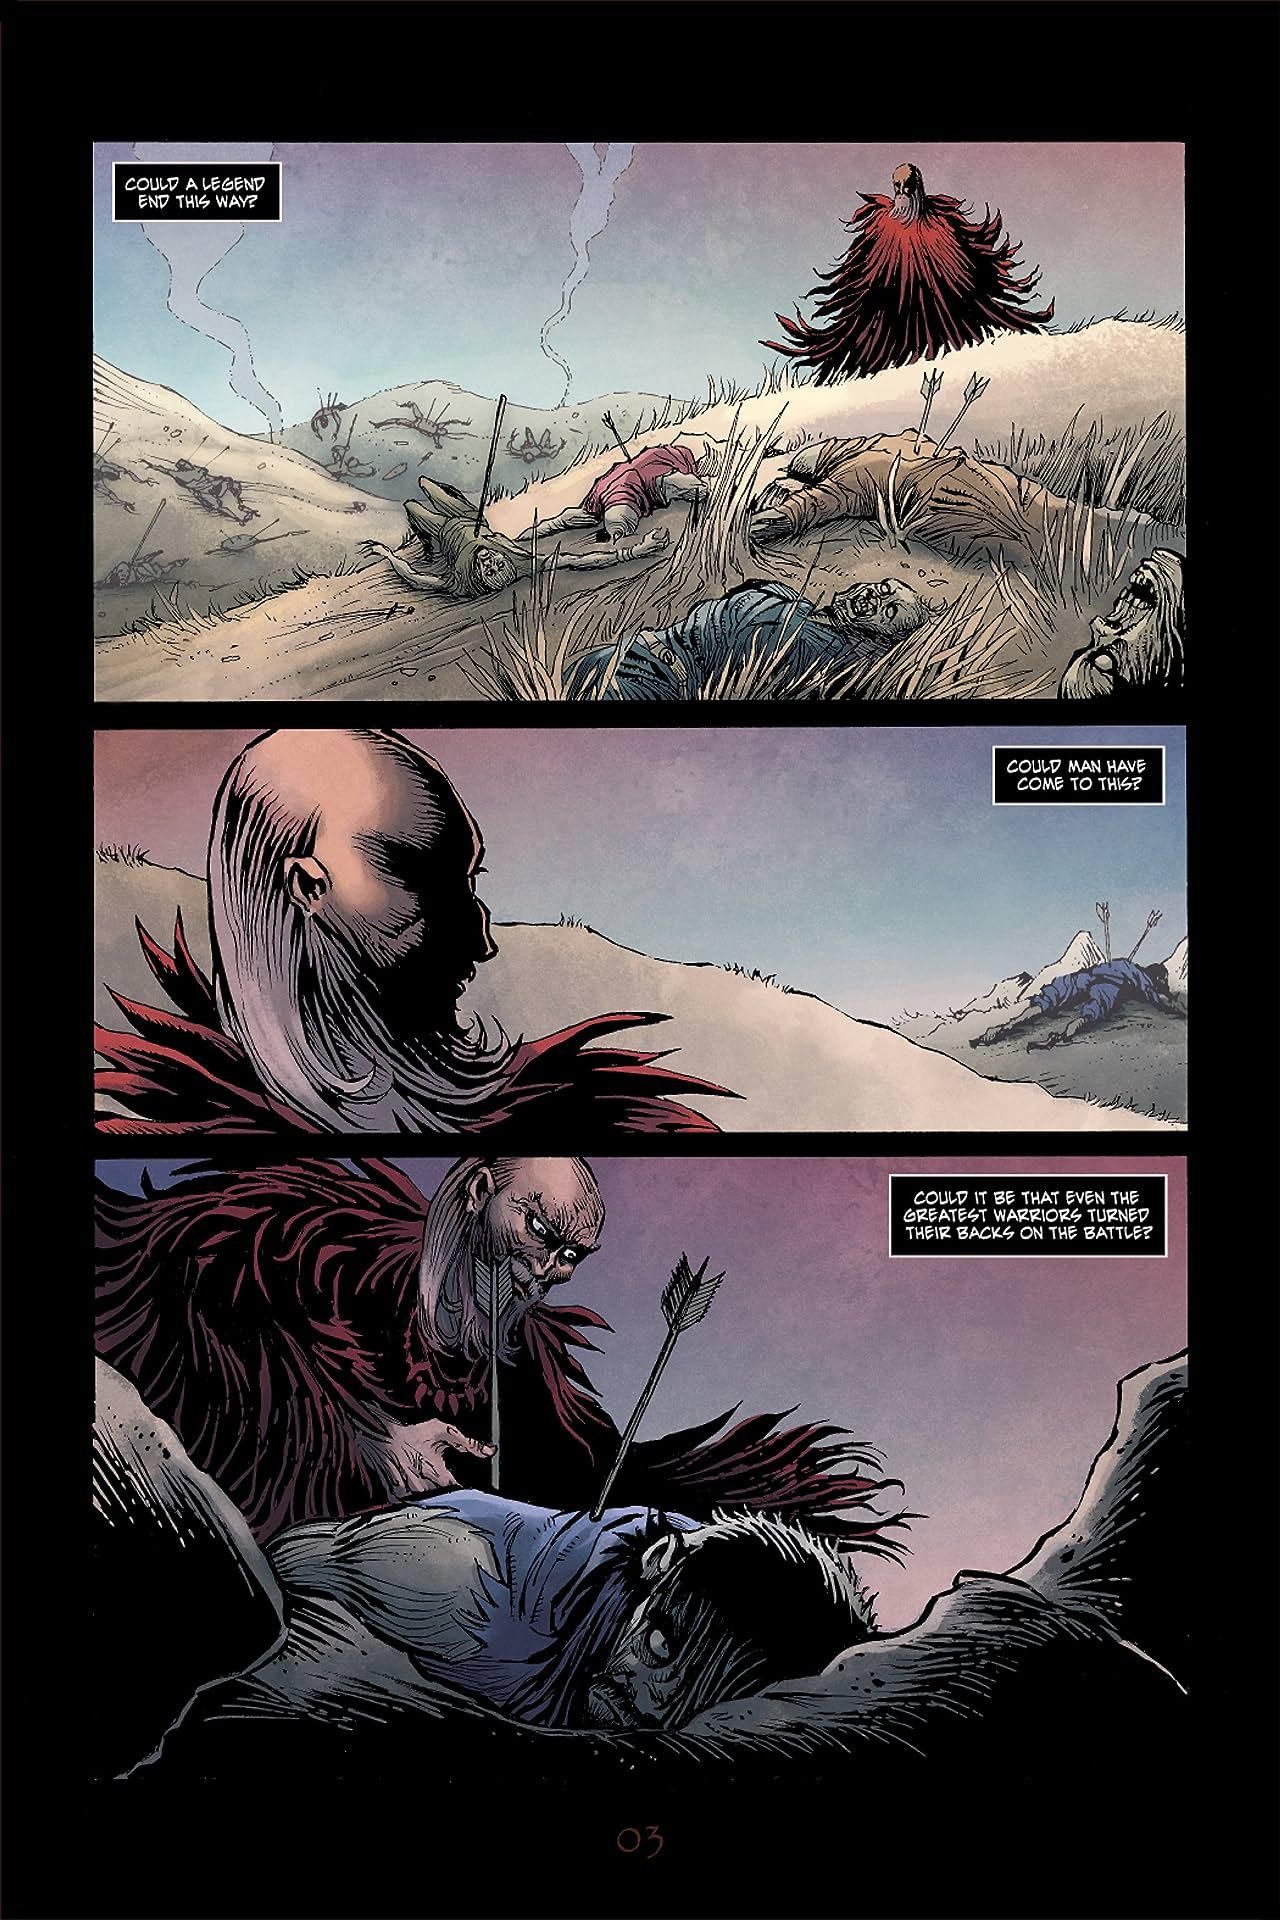 Dark Age - The Shaman's Legacy #1